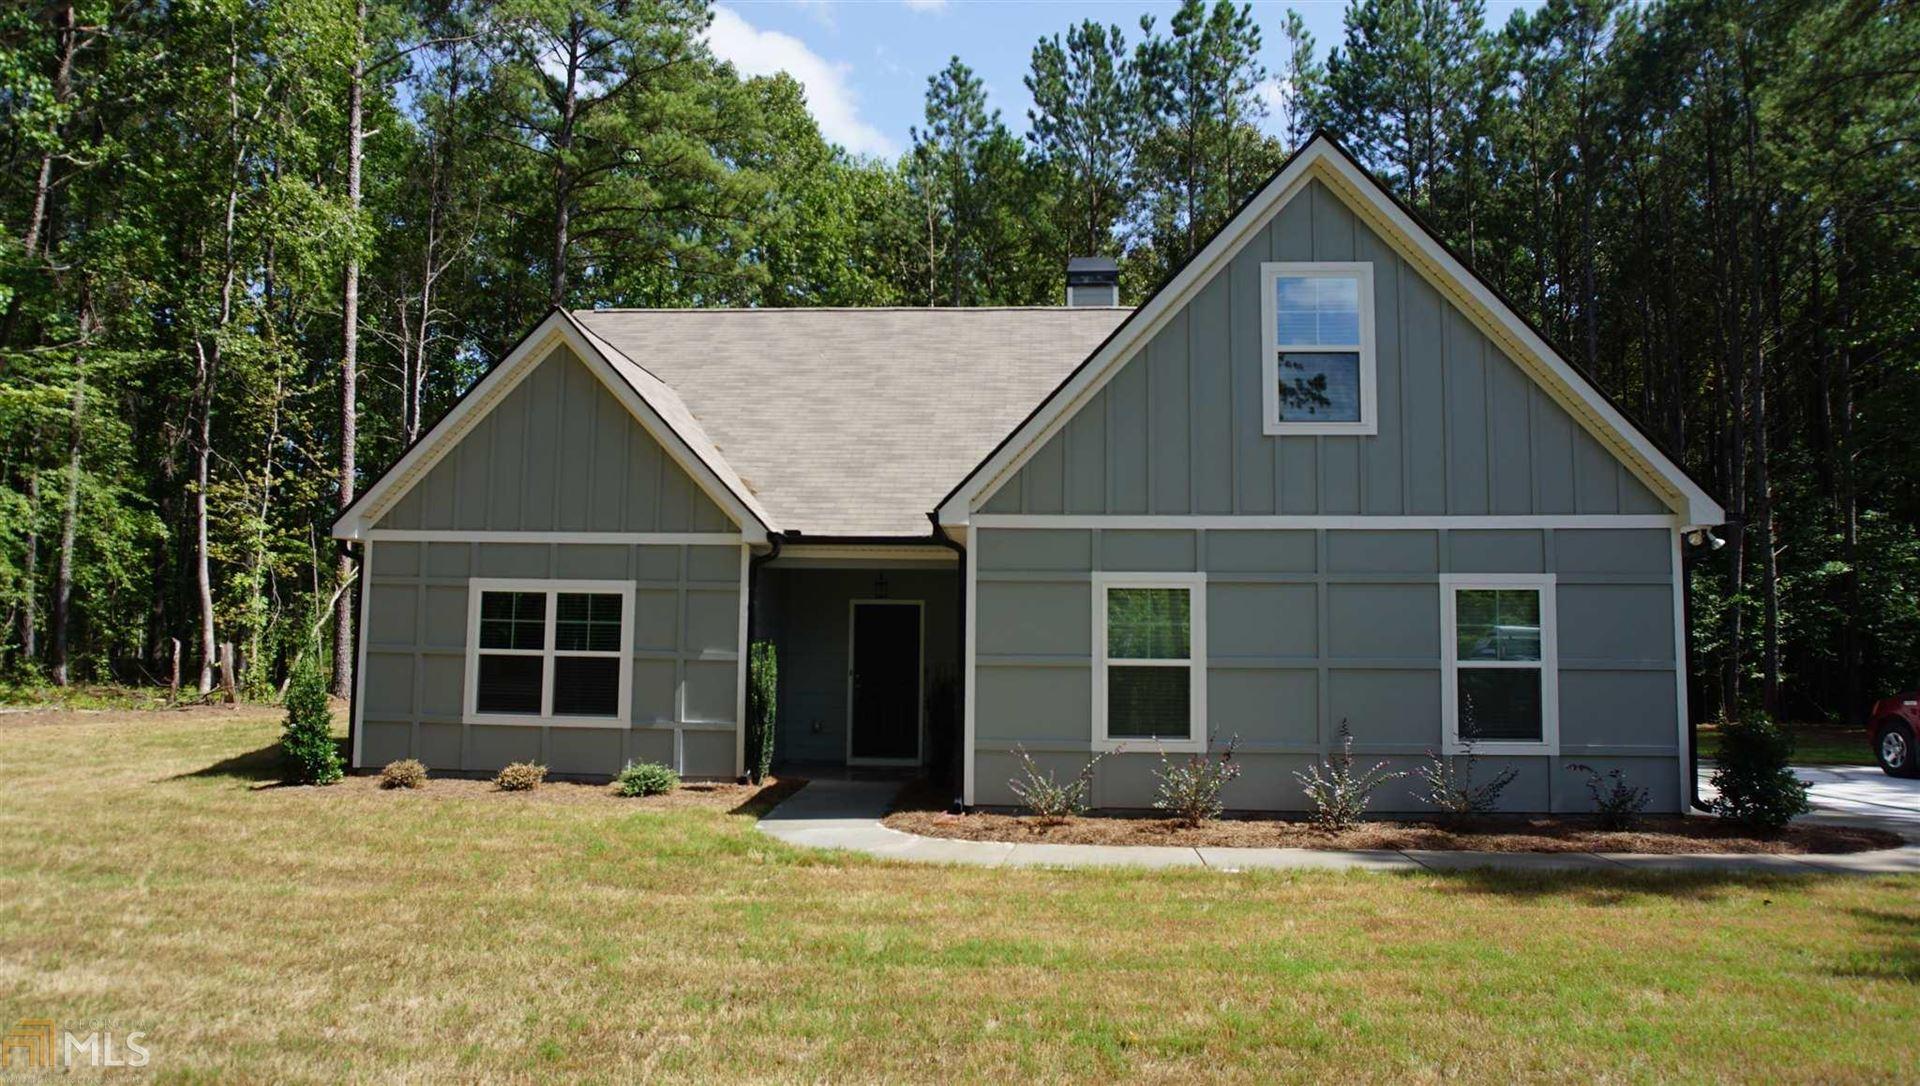 Lot 1 Lockwood Glen, Senoia, GA 30276 - #: 8734578